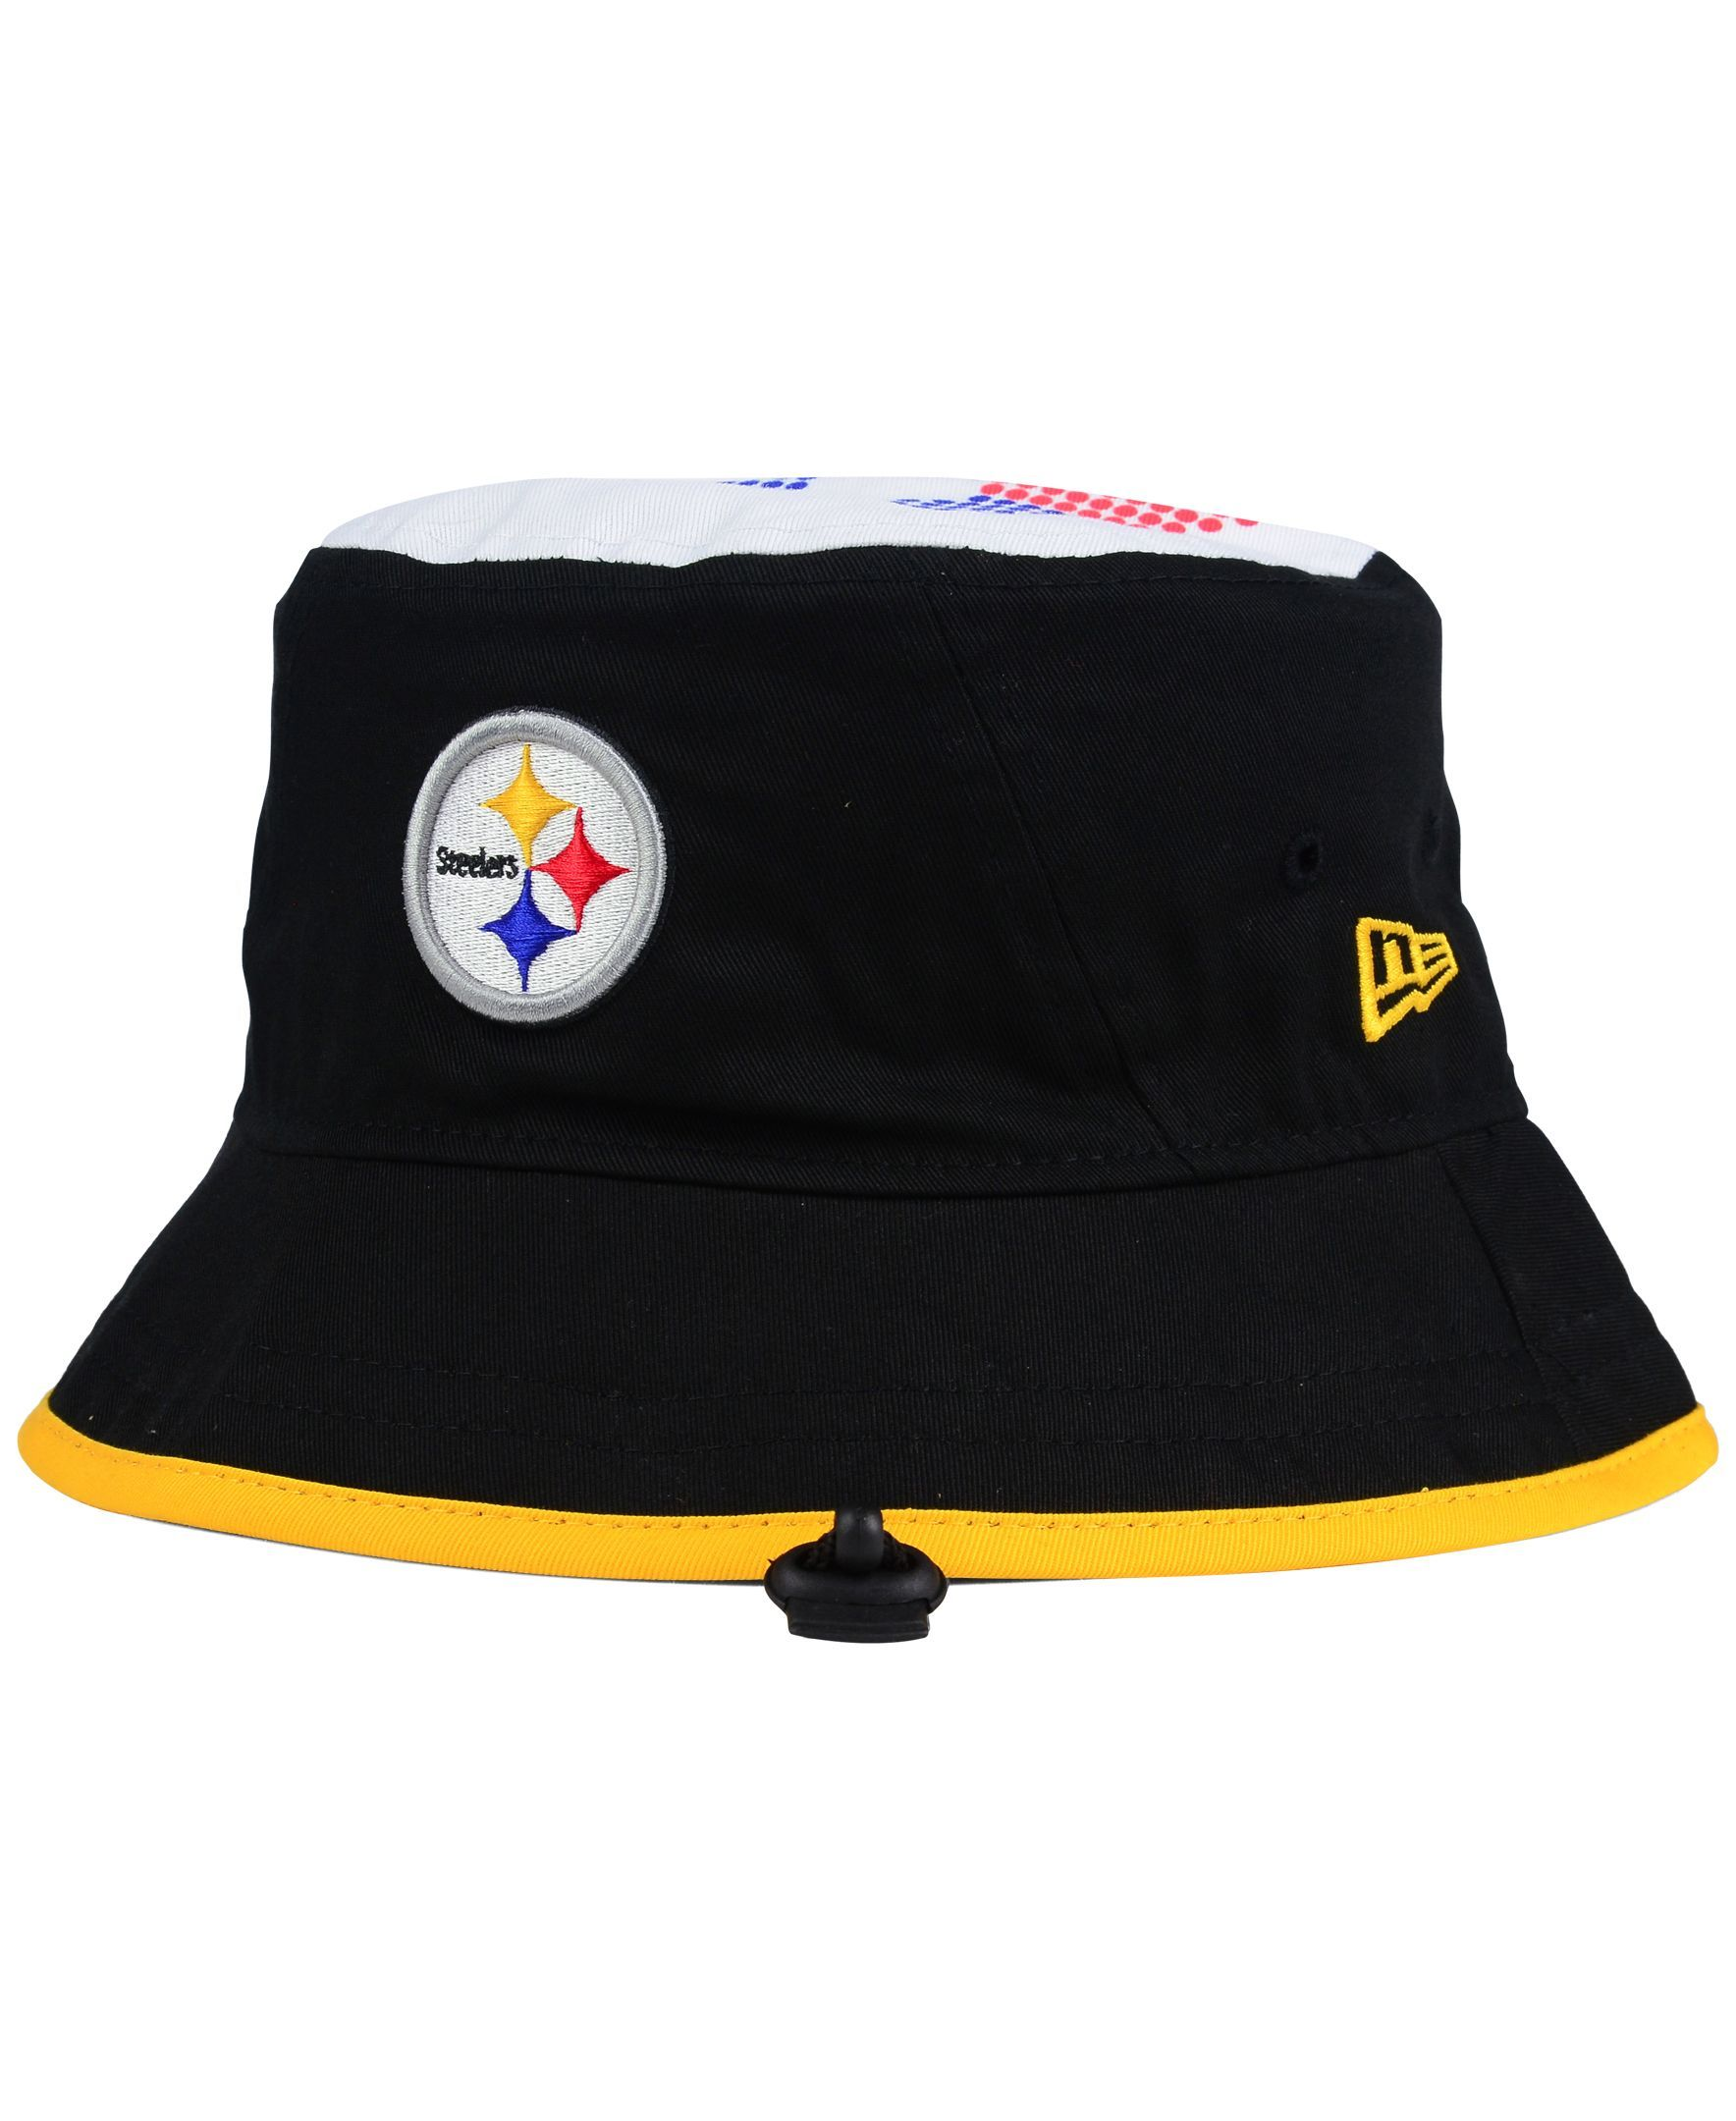 New Era Pittsburgh Steelers Traveler Bucket Hat  aee92d7fd